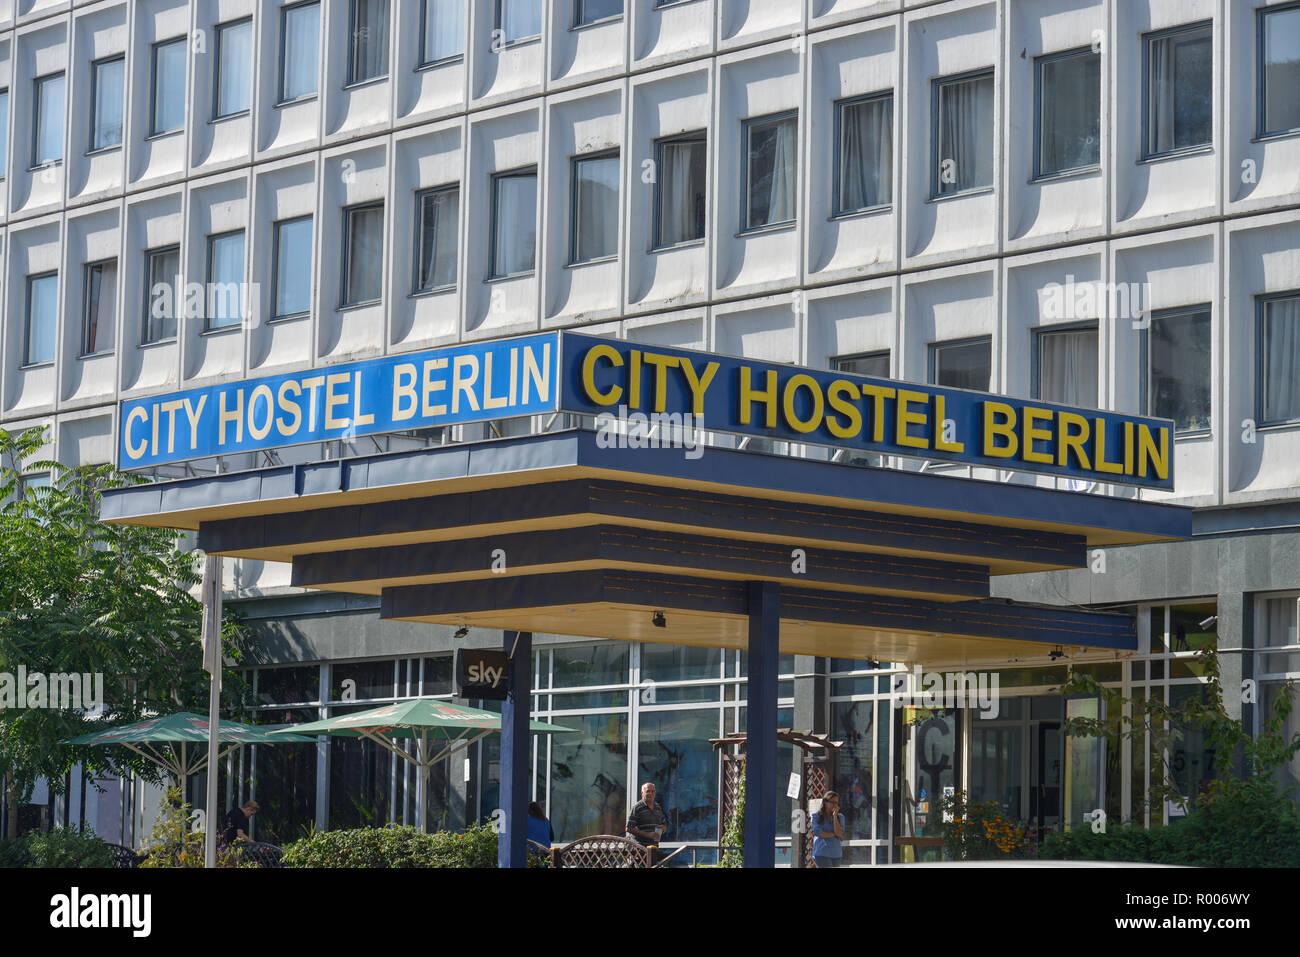 City Hostel Glinkastrasse Middle Berlin Germany Mitte